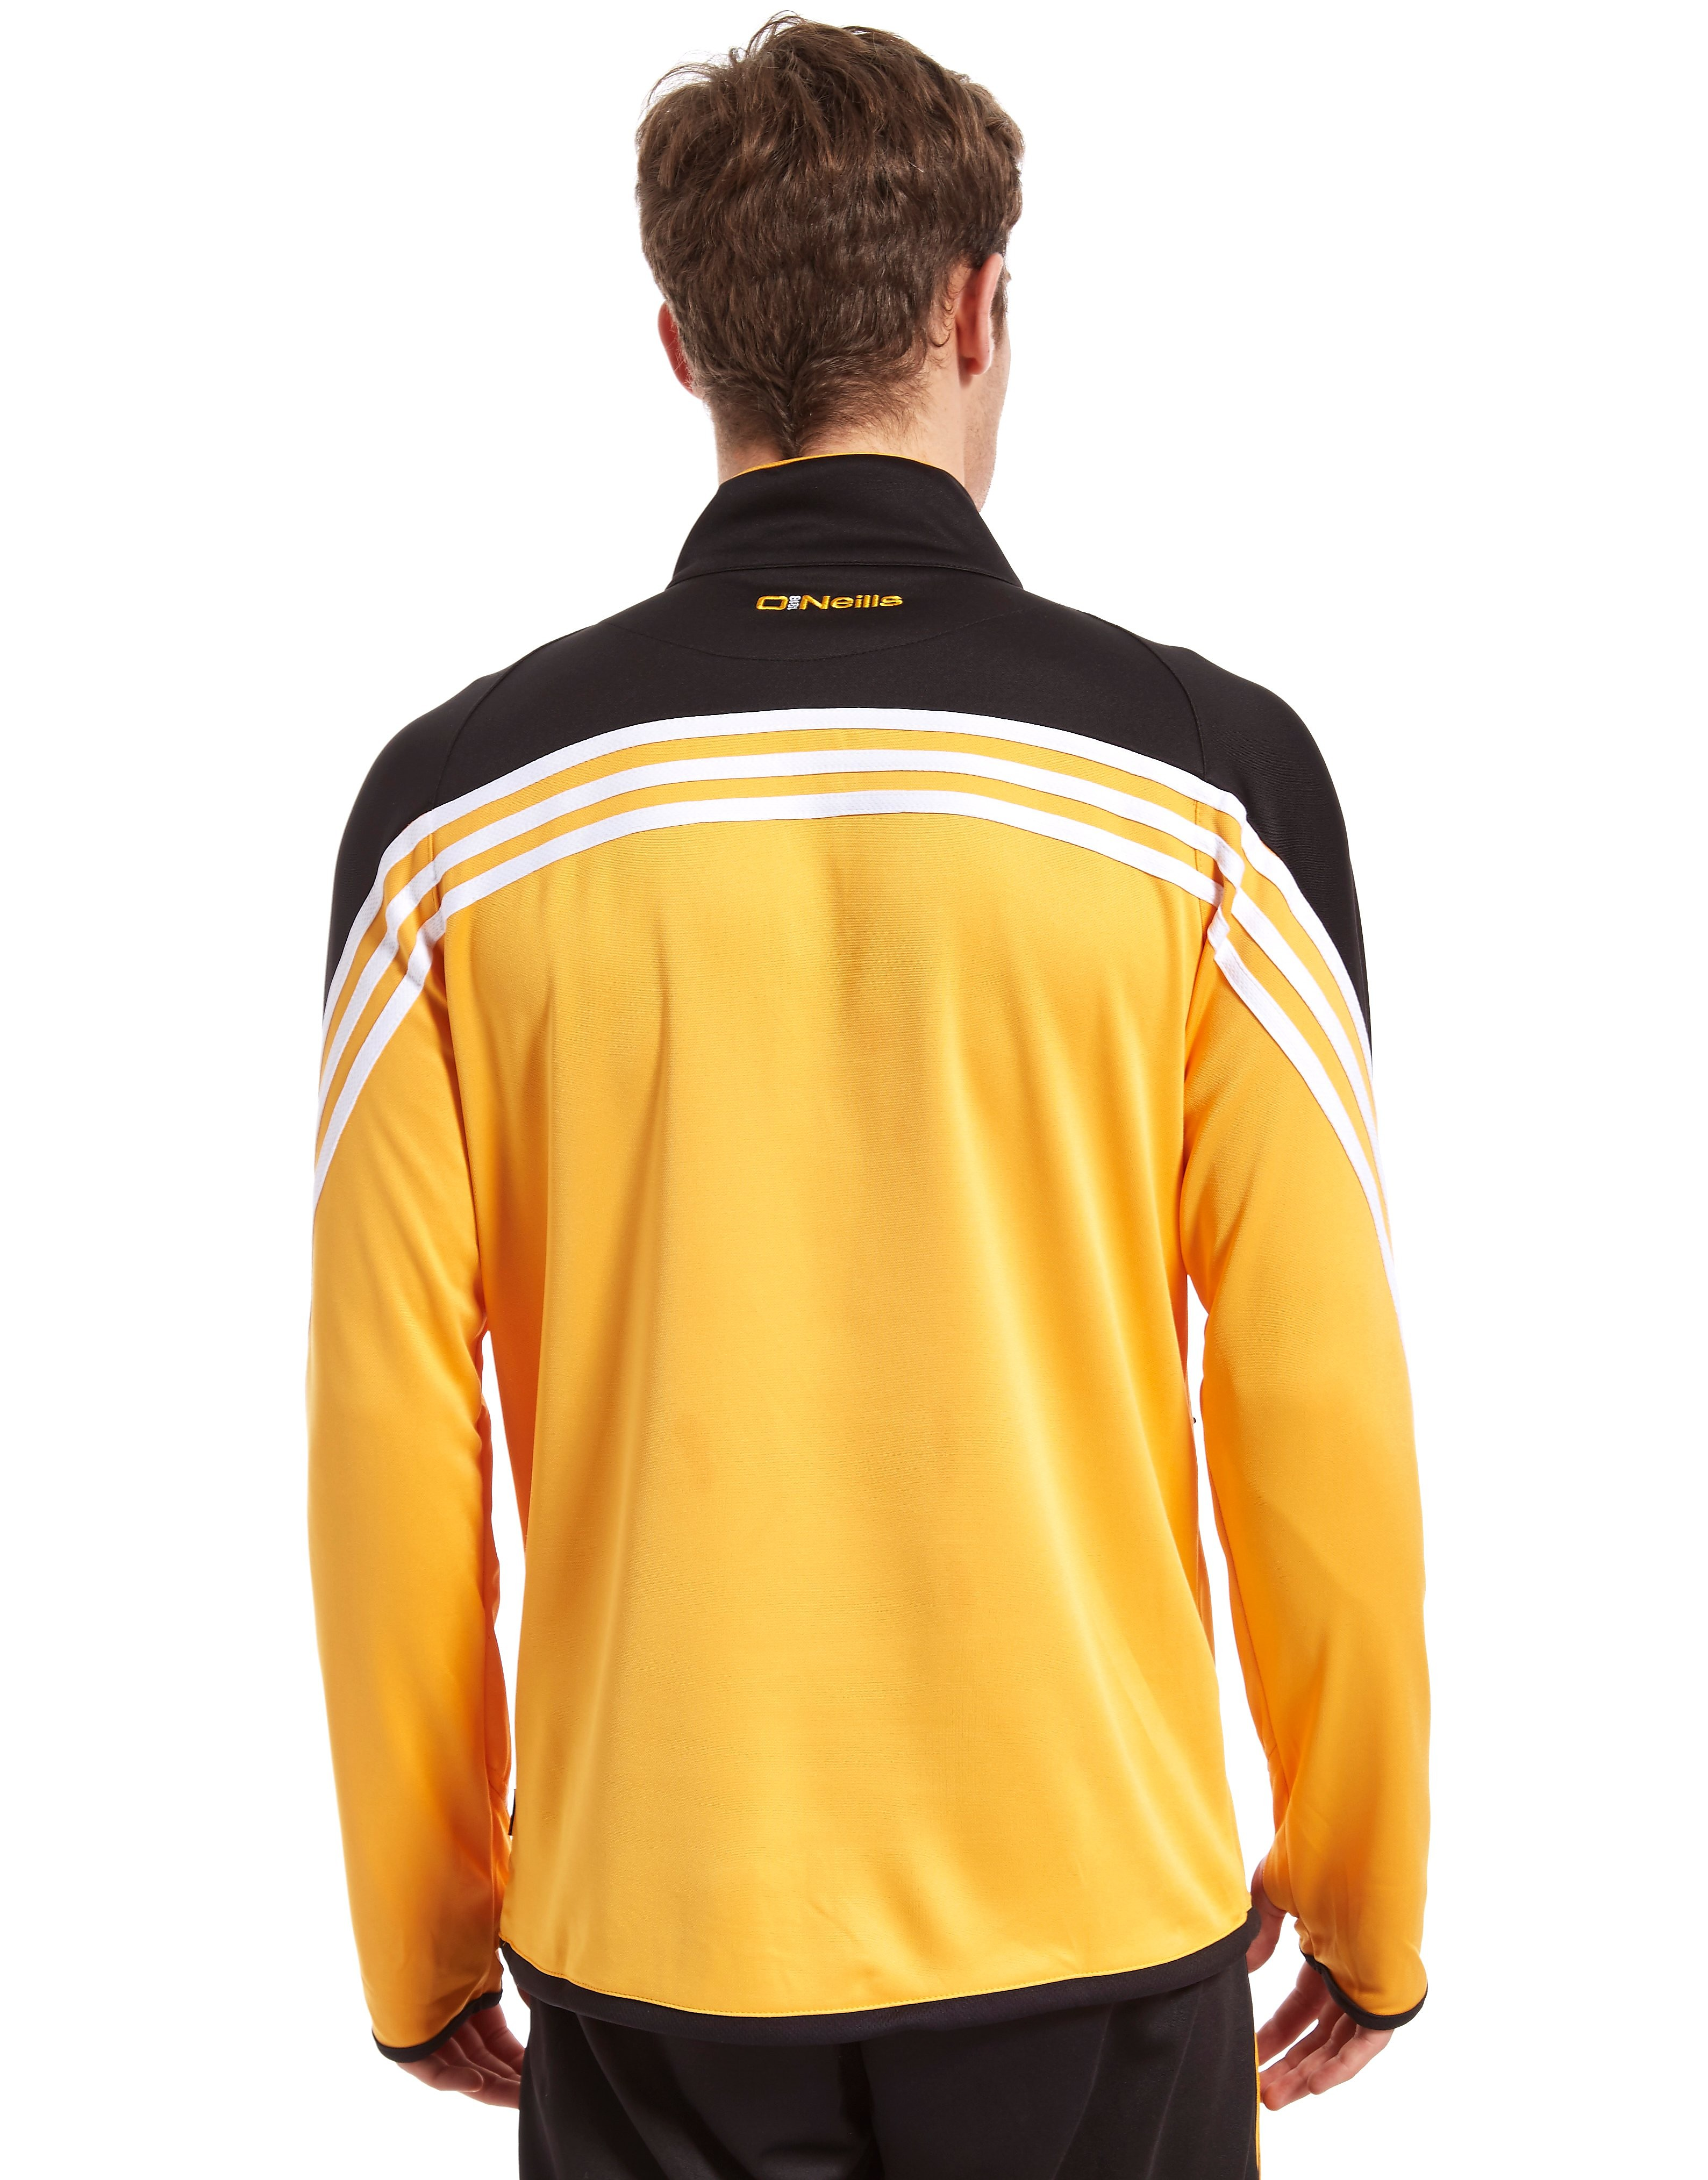 O'Neills Kilkenny Half Zip Jacket